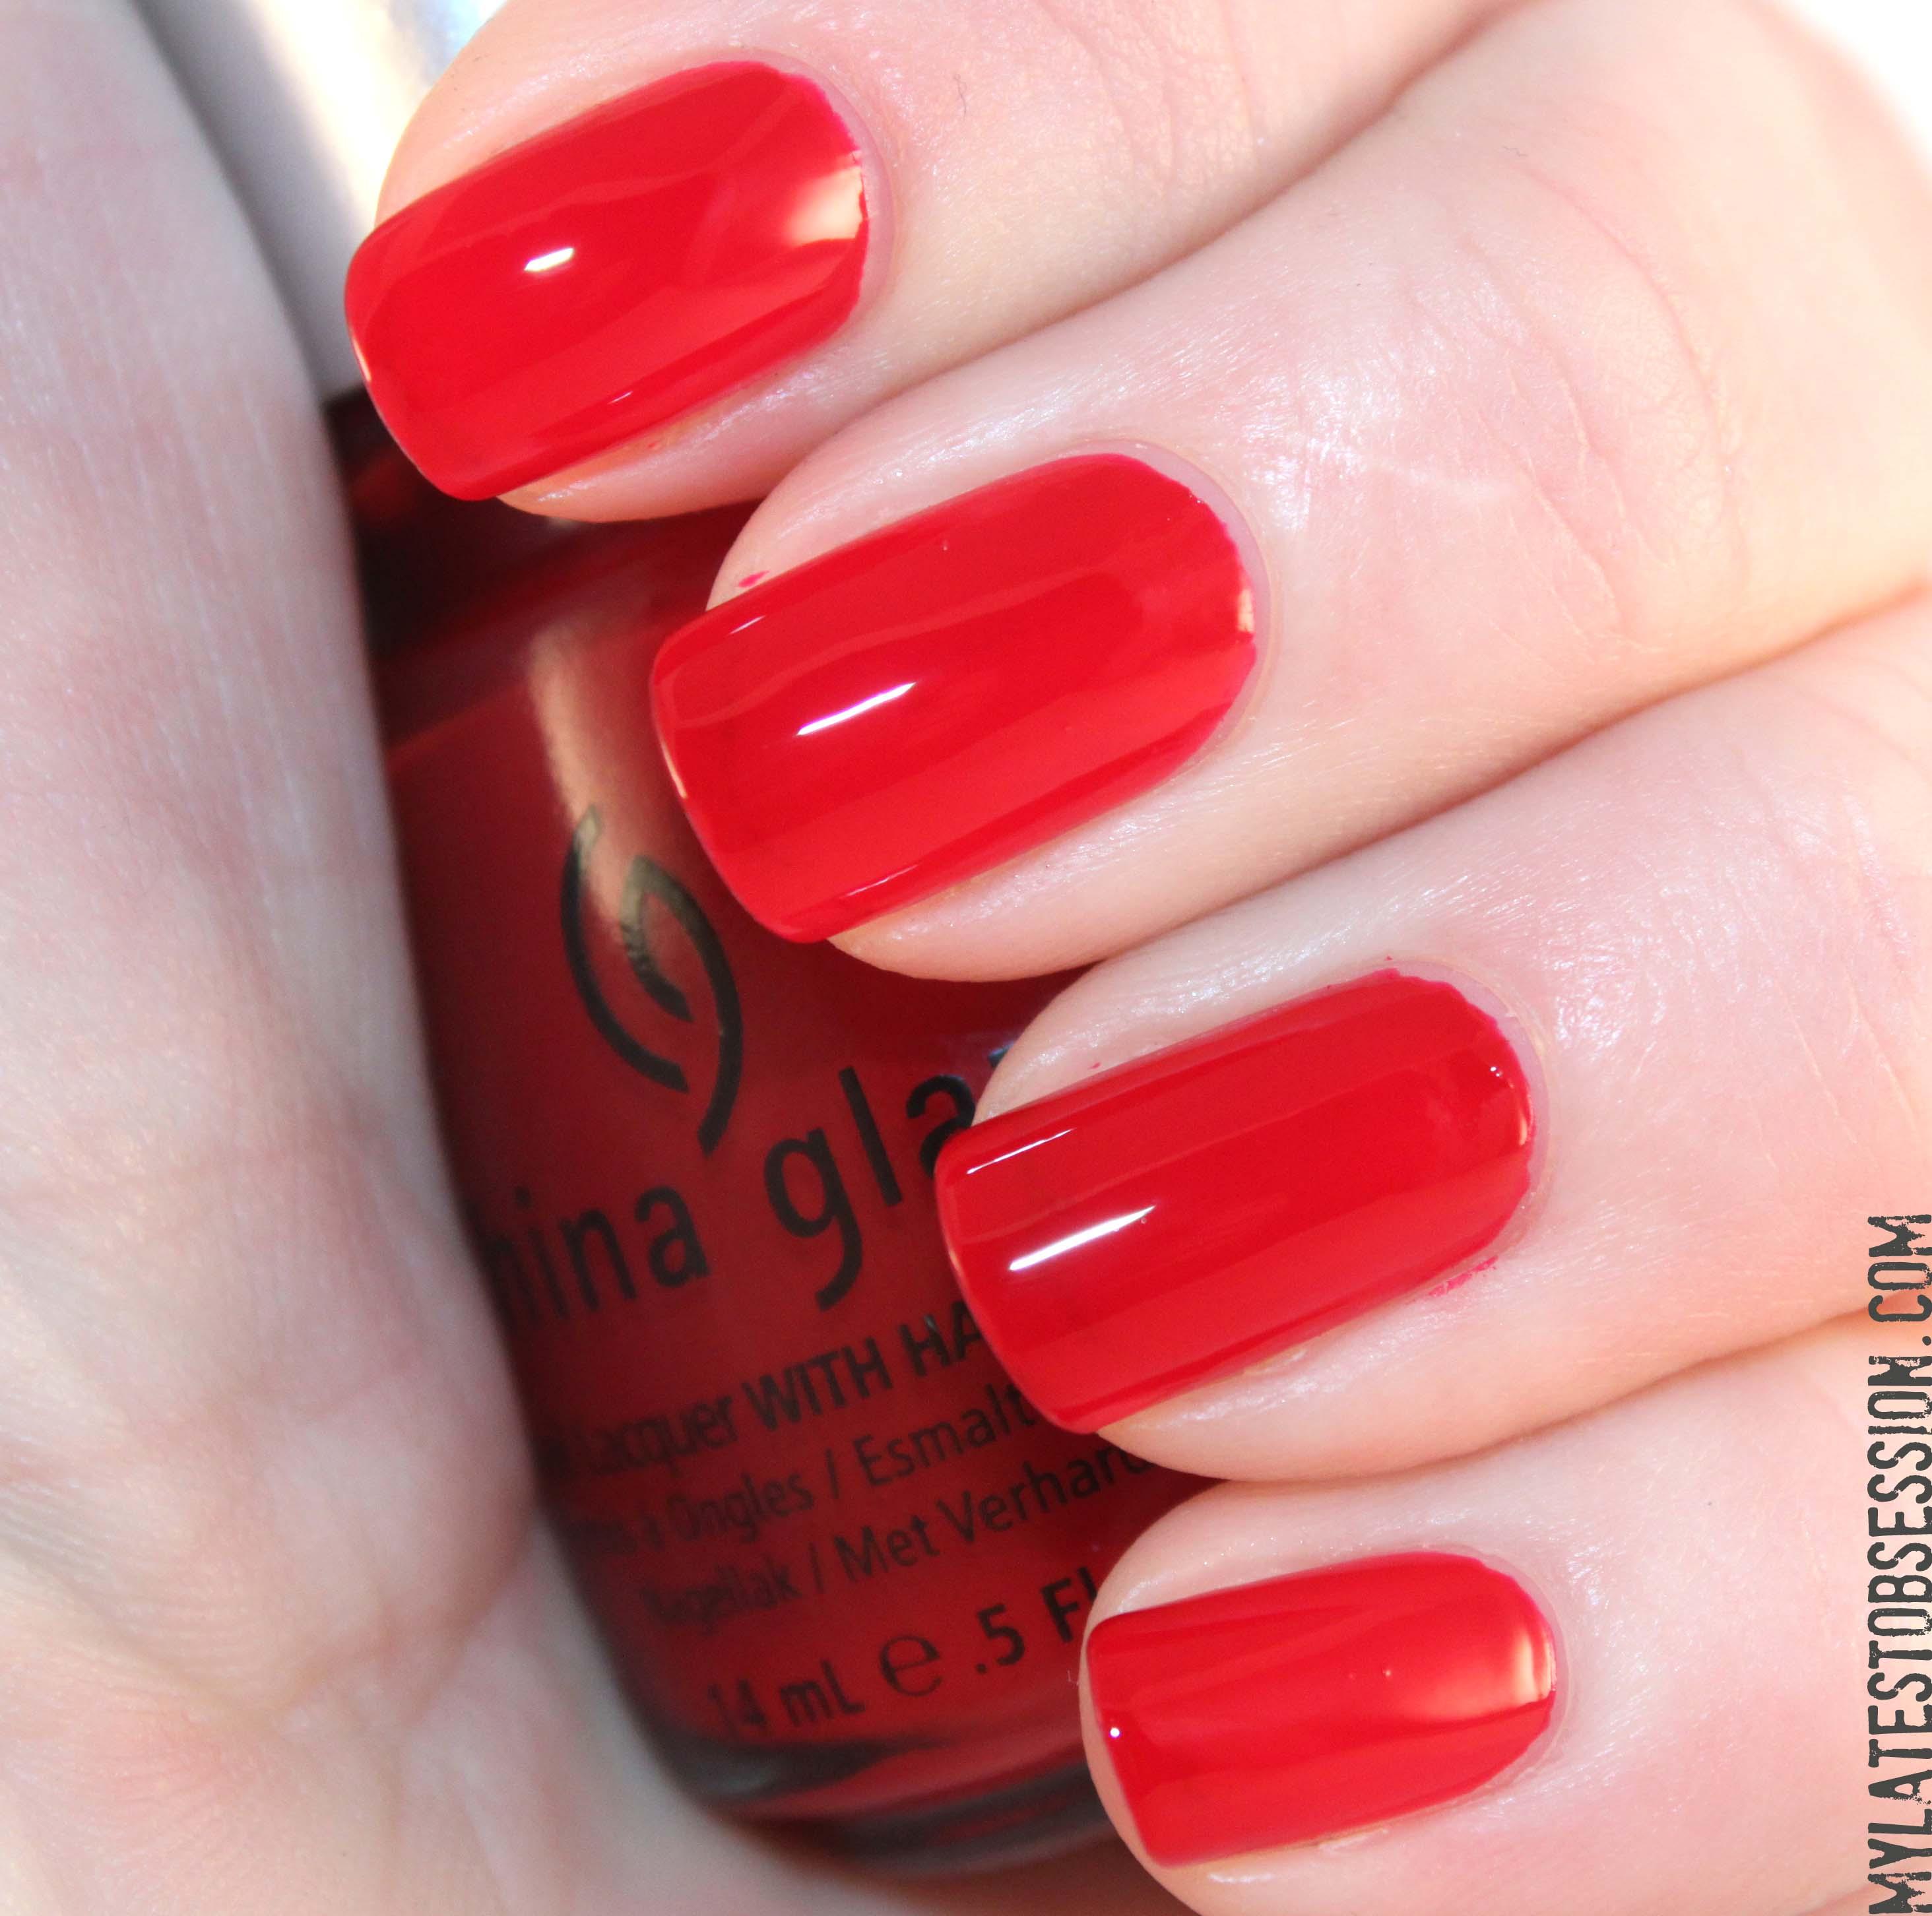 China Glaze Nail Polish Paint The Town Red